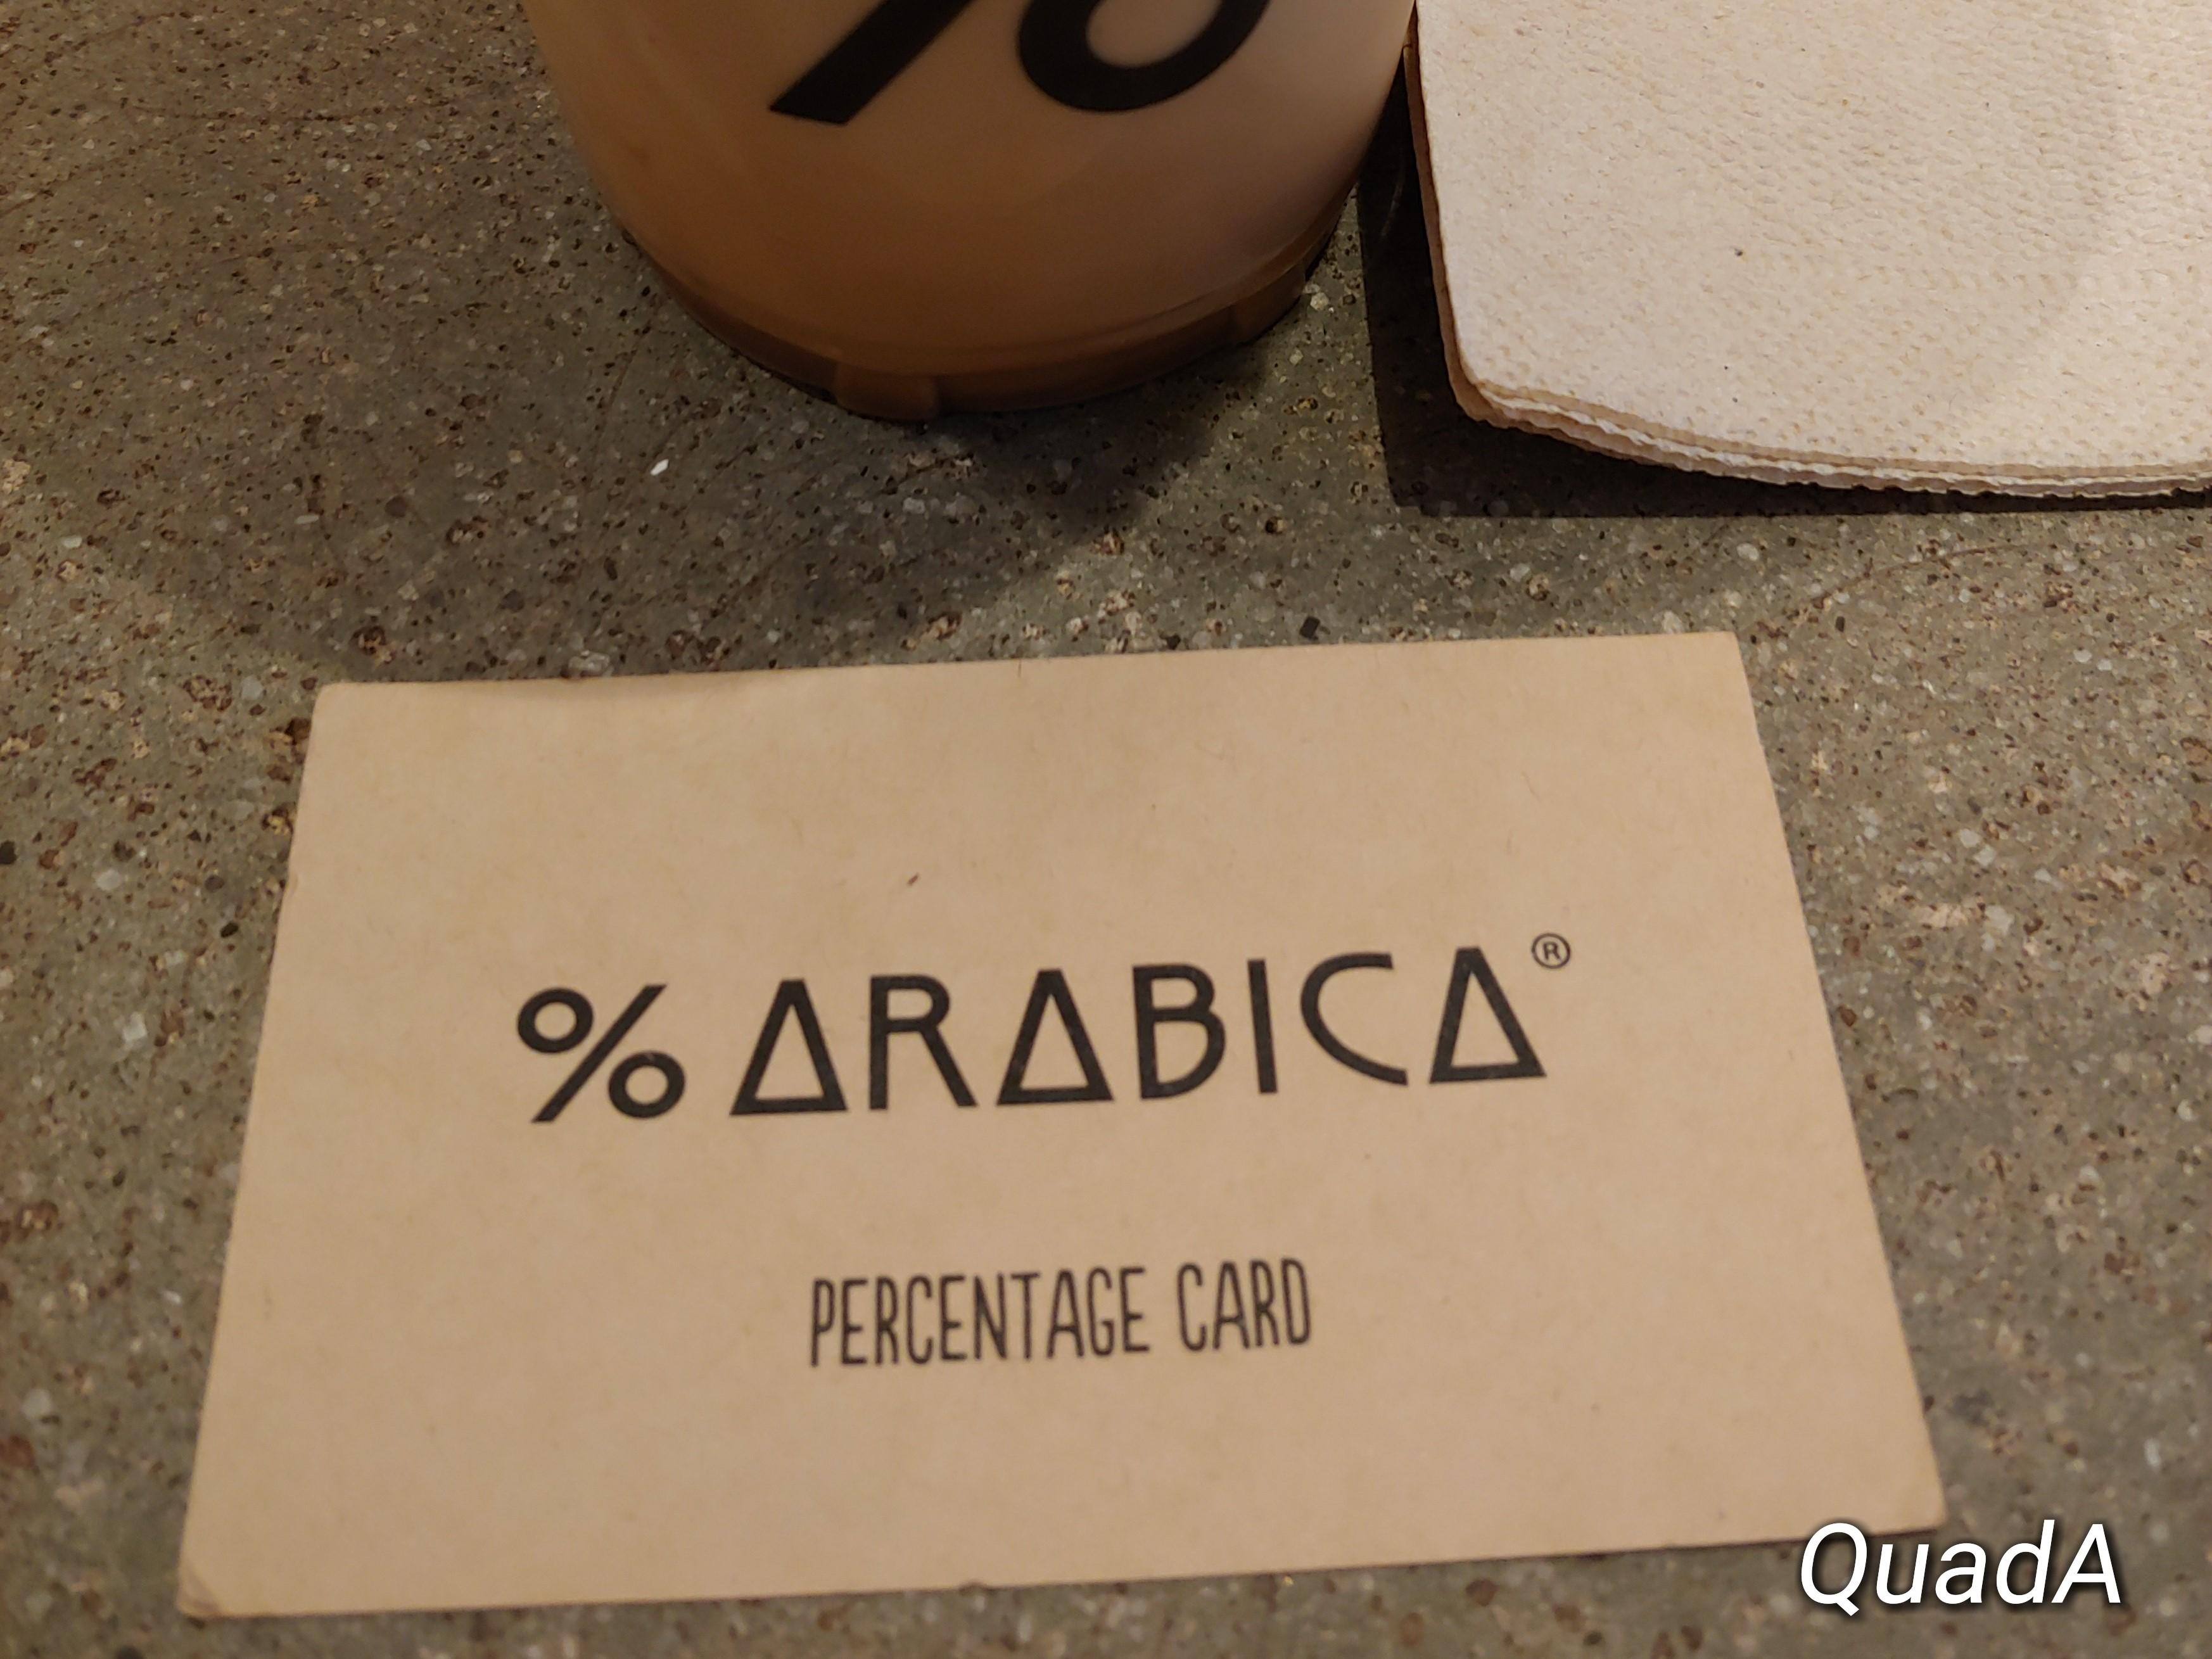 Arabica percentage card